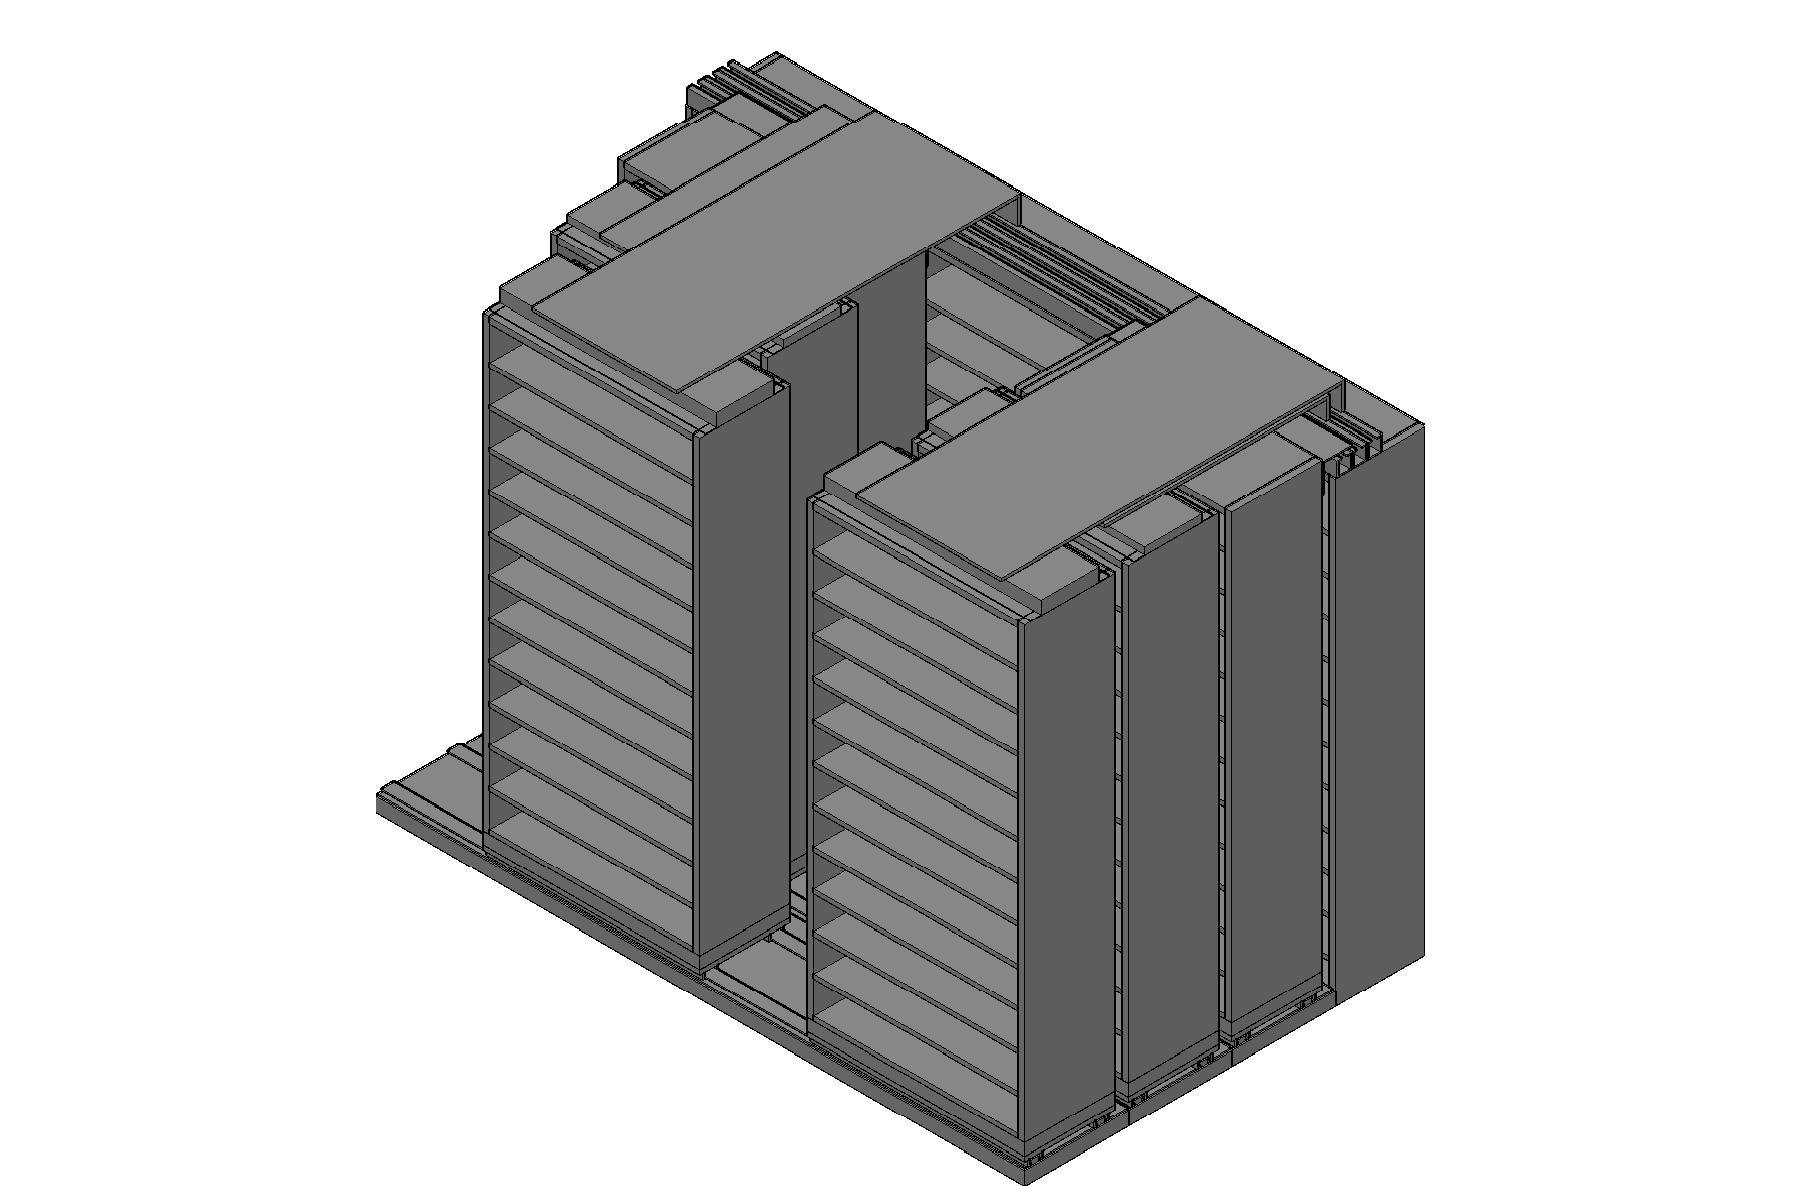 "Bin Size Sliding Shelves - 4 Rows Deep - 12 Levels - (36"" x 15"" Shelves) - 112"" Total Width"